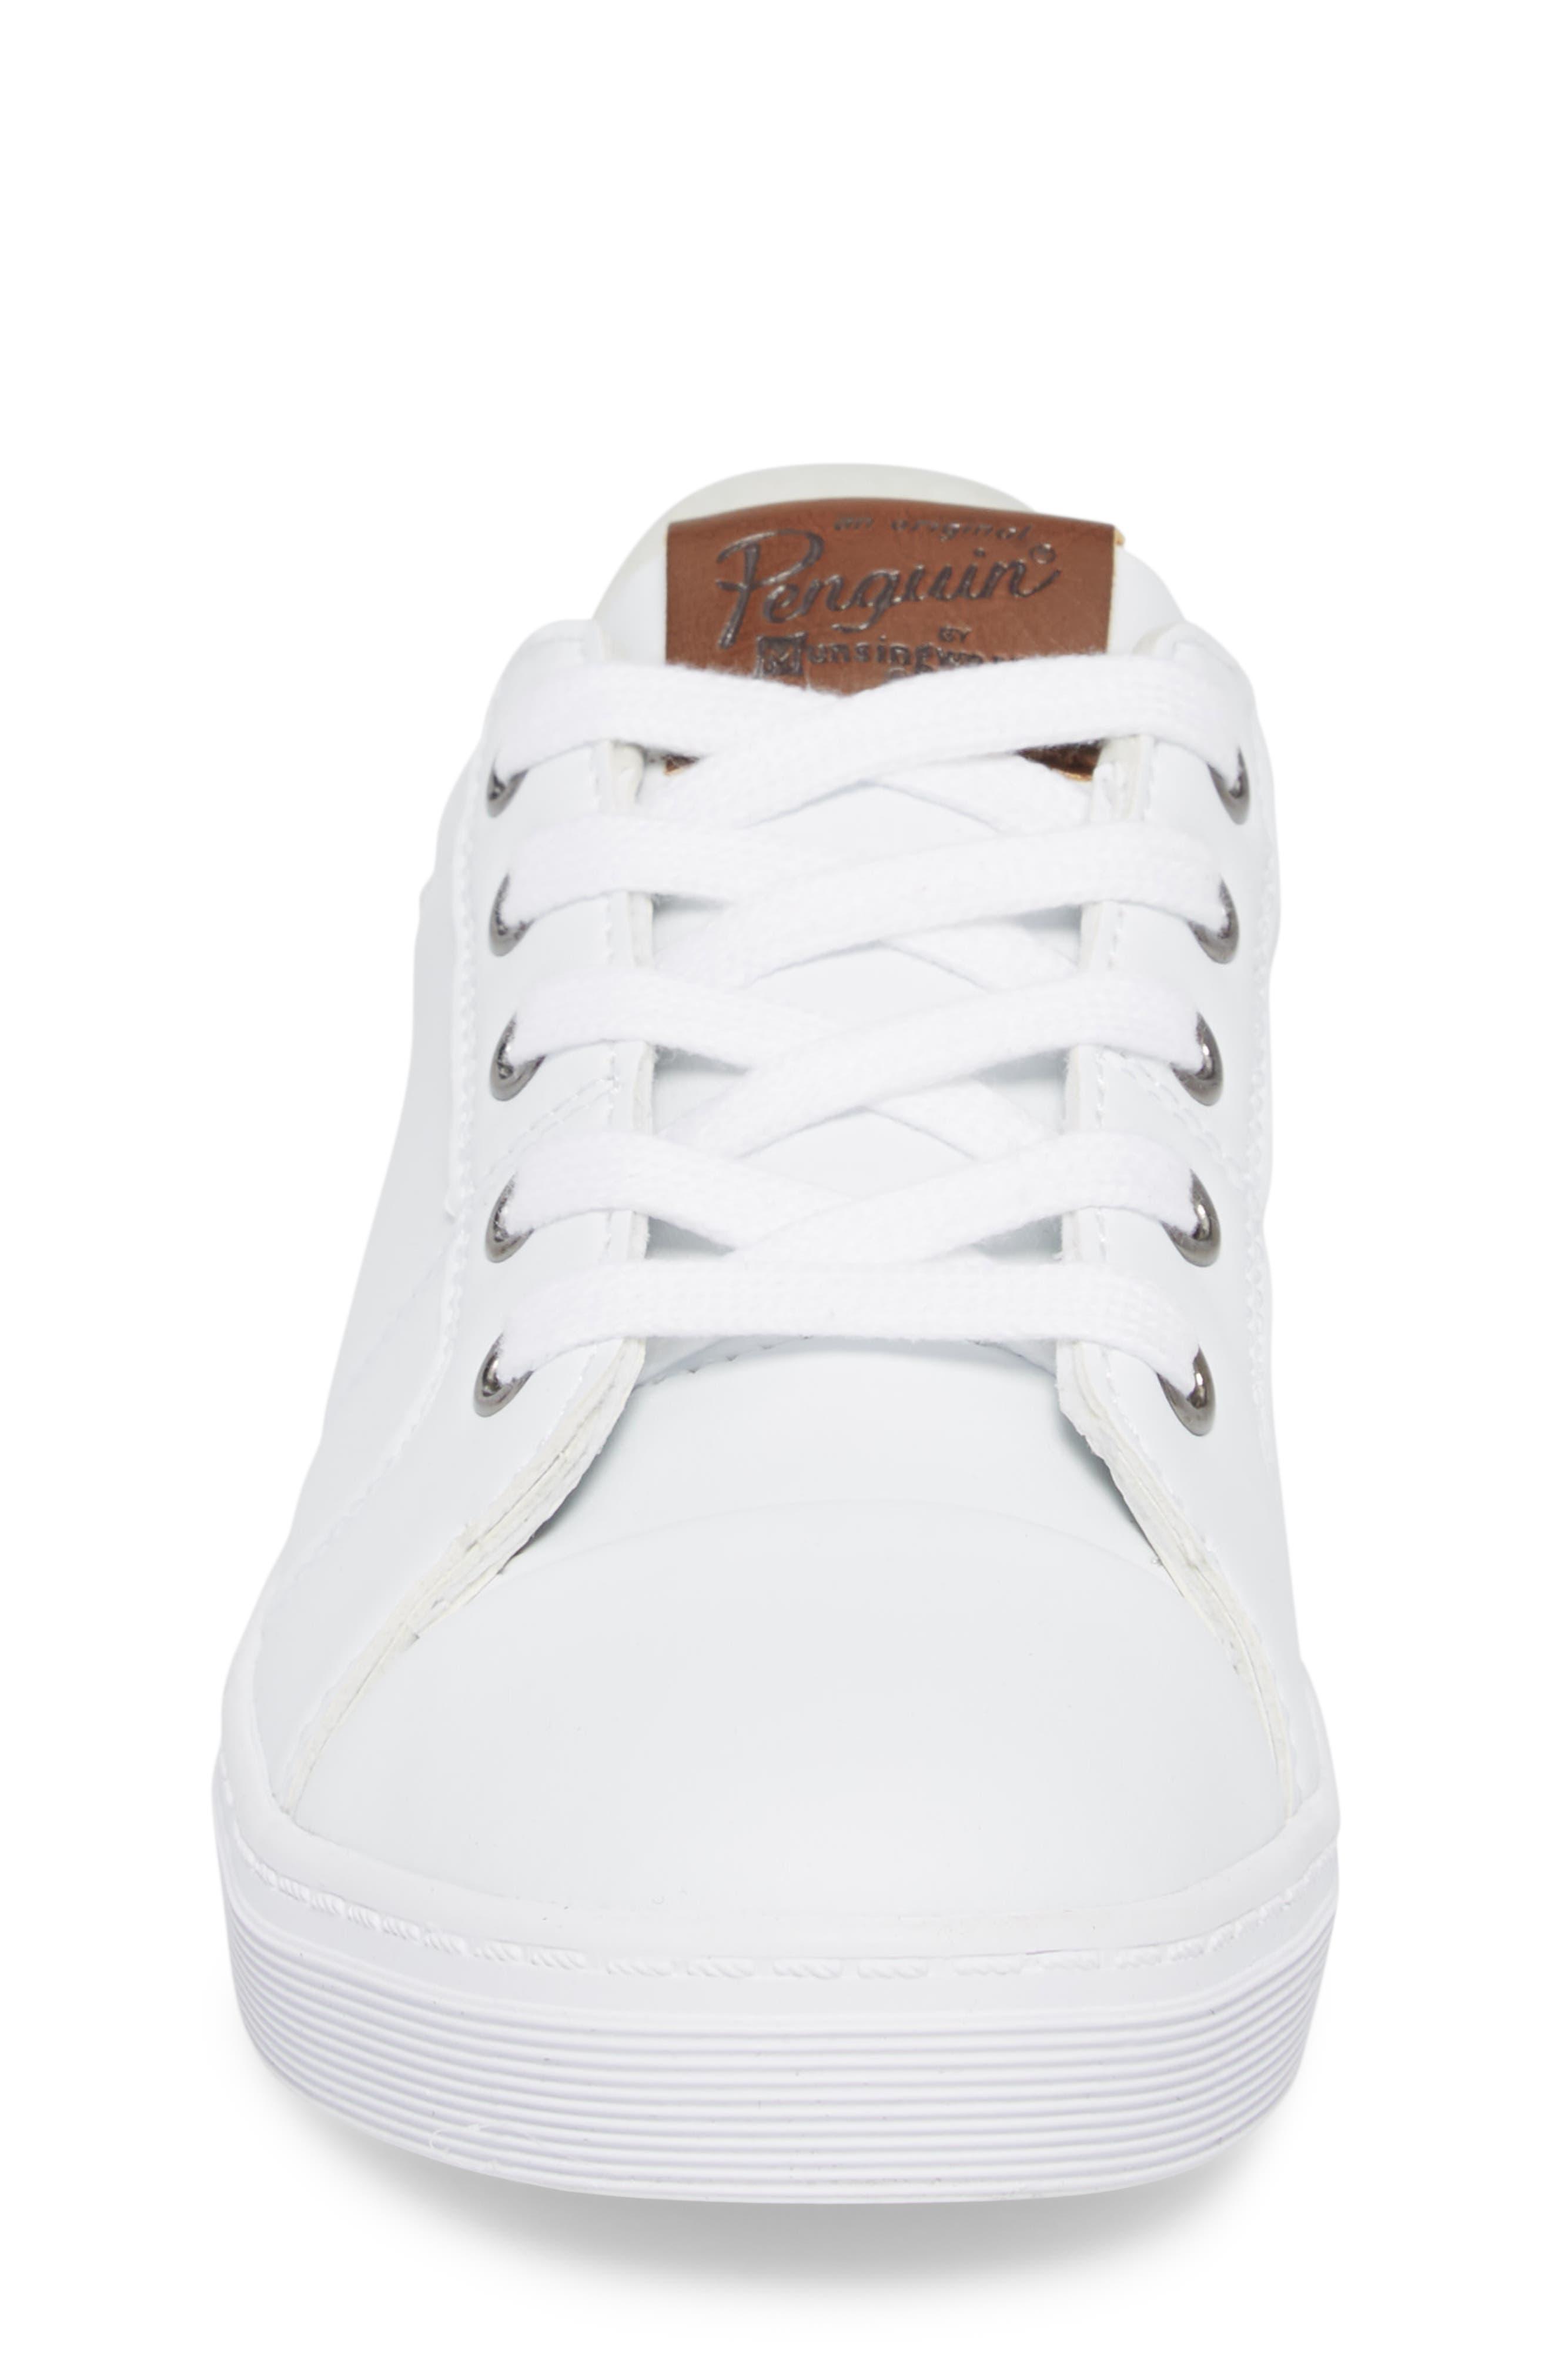 Cobin Sneaker,                             Alternate thumbnail 4, color,                             White/ Cognac